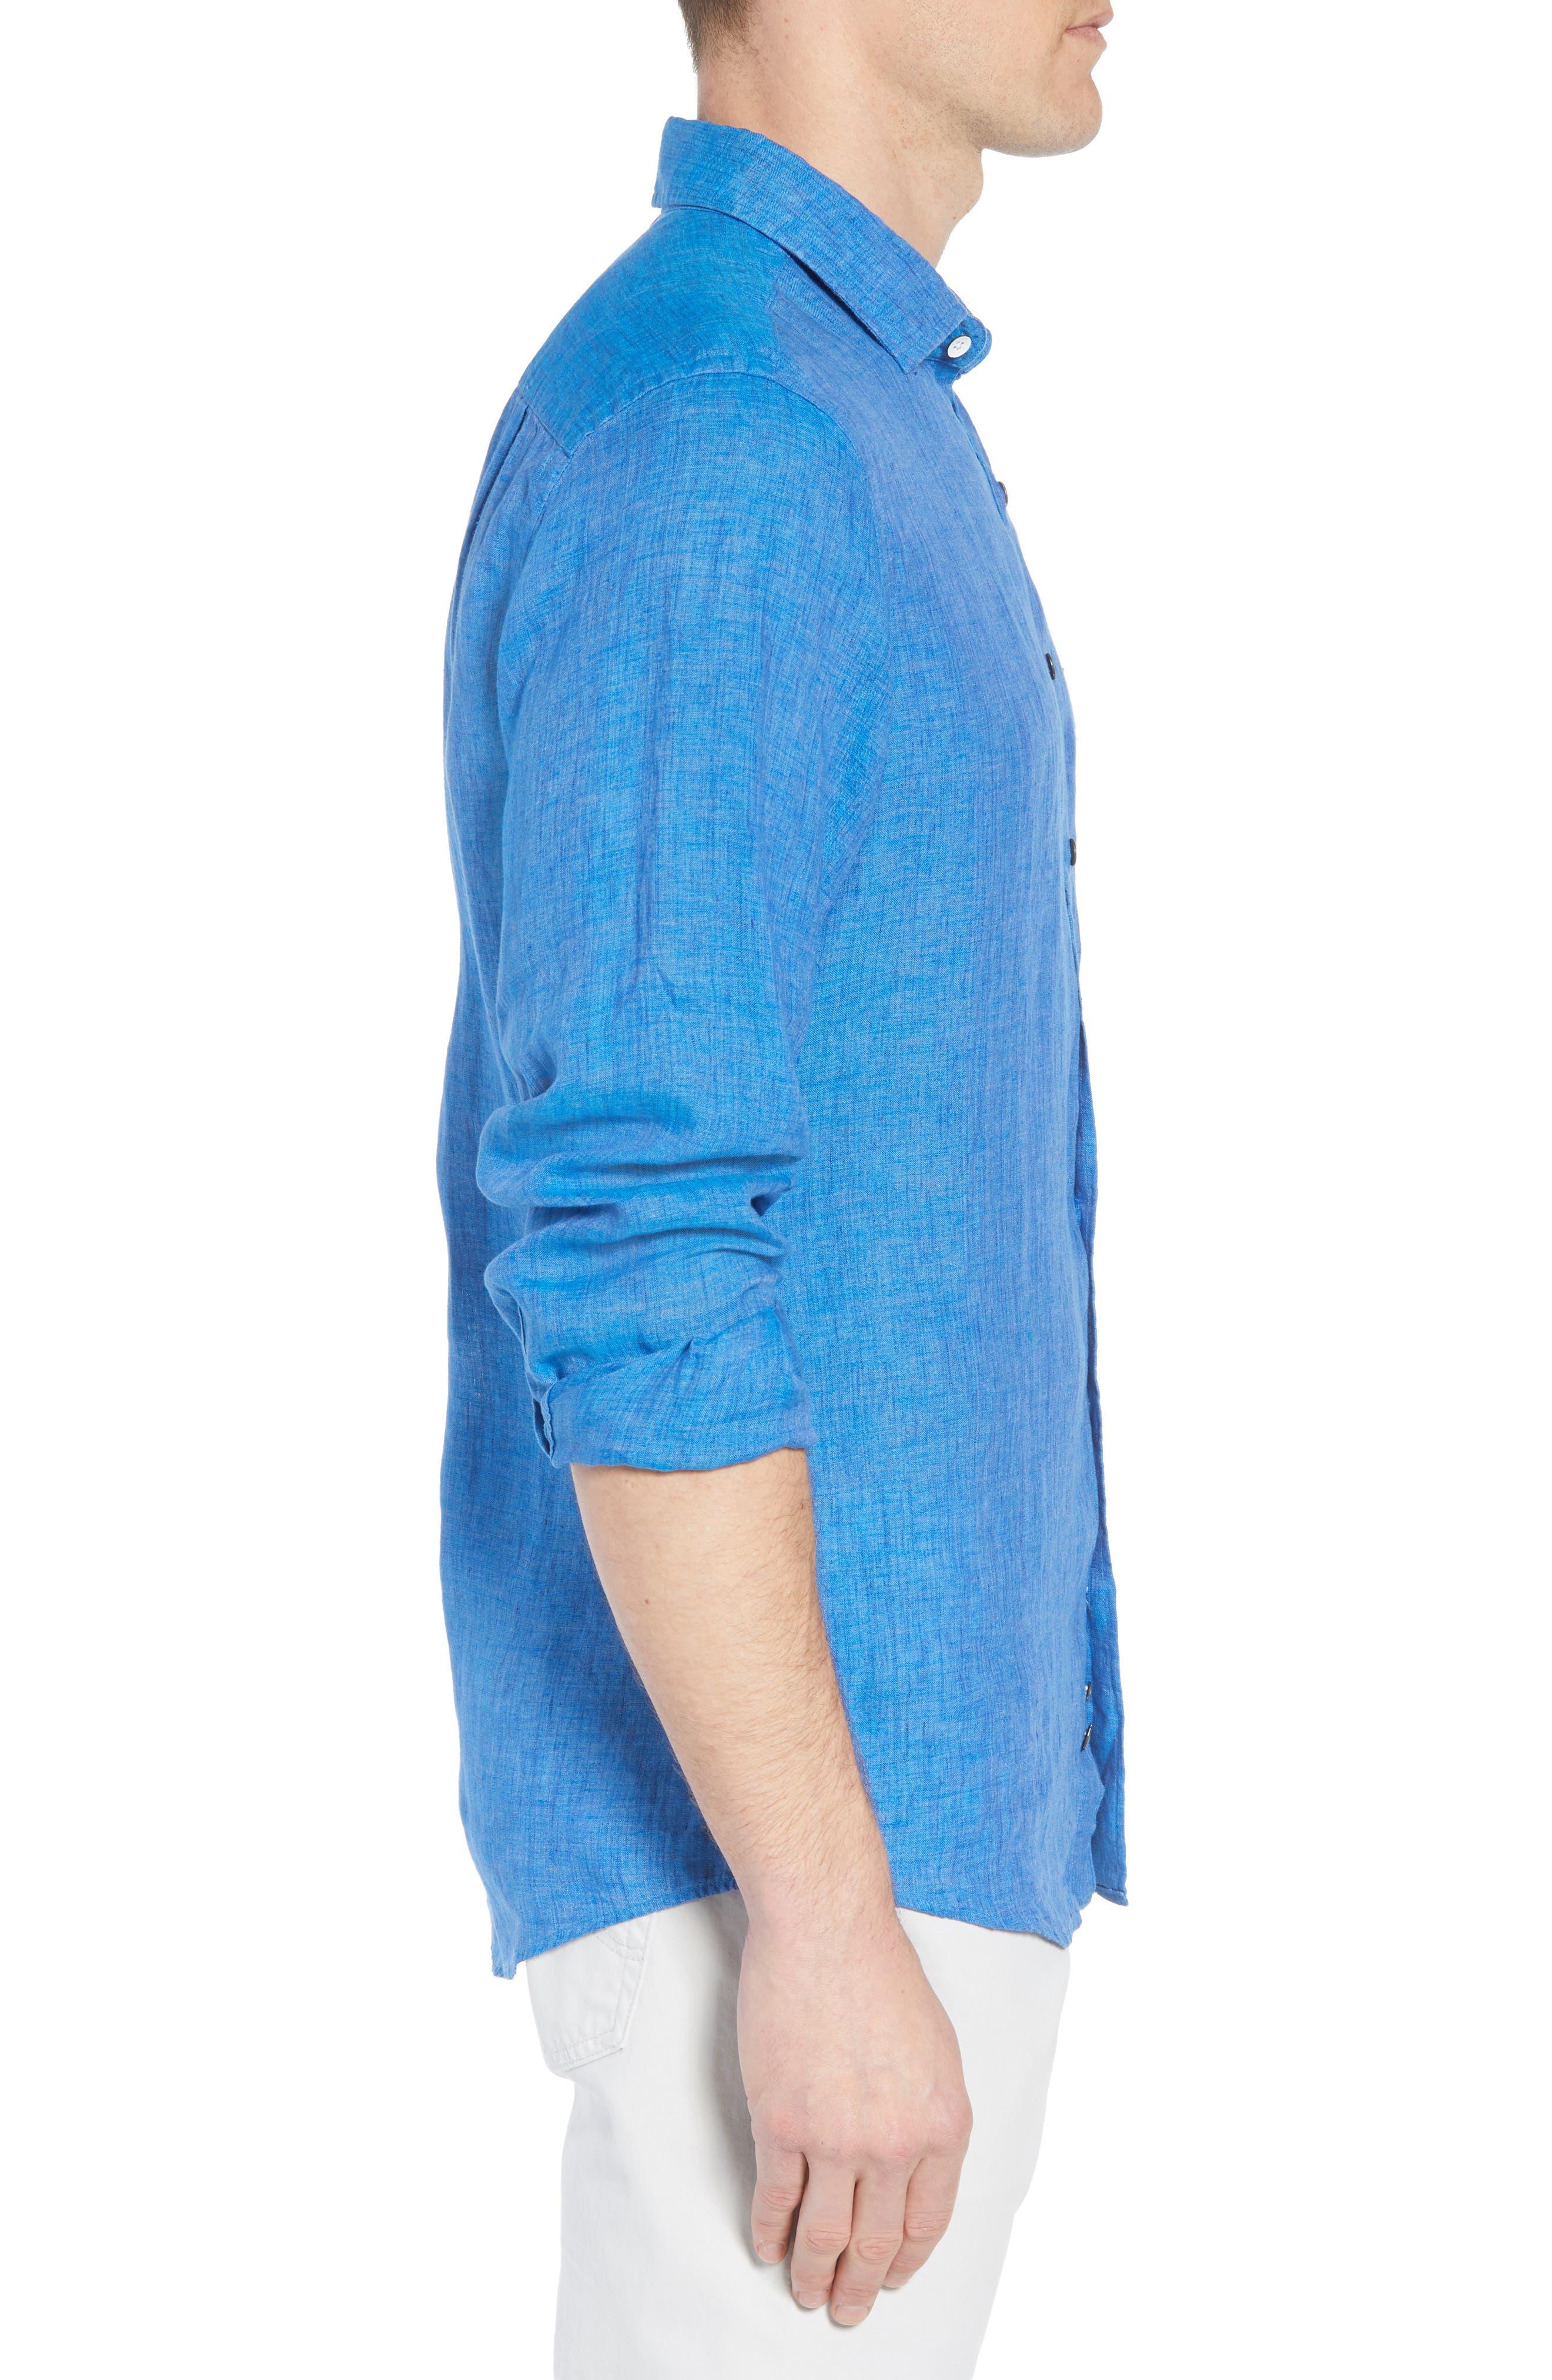 RODD & GUNN,                             Harris Bay Regular Fit Linen Sport Shirt,                             Alternate thumbnail 3, color,                             438